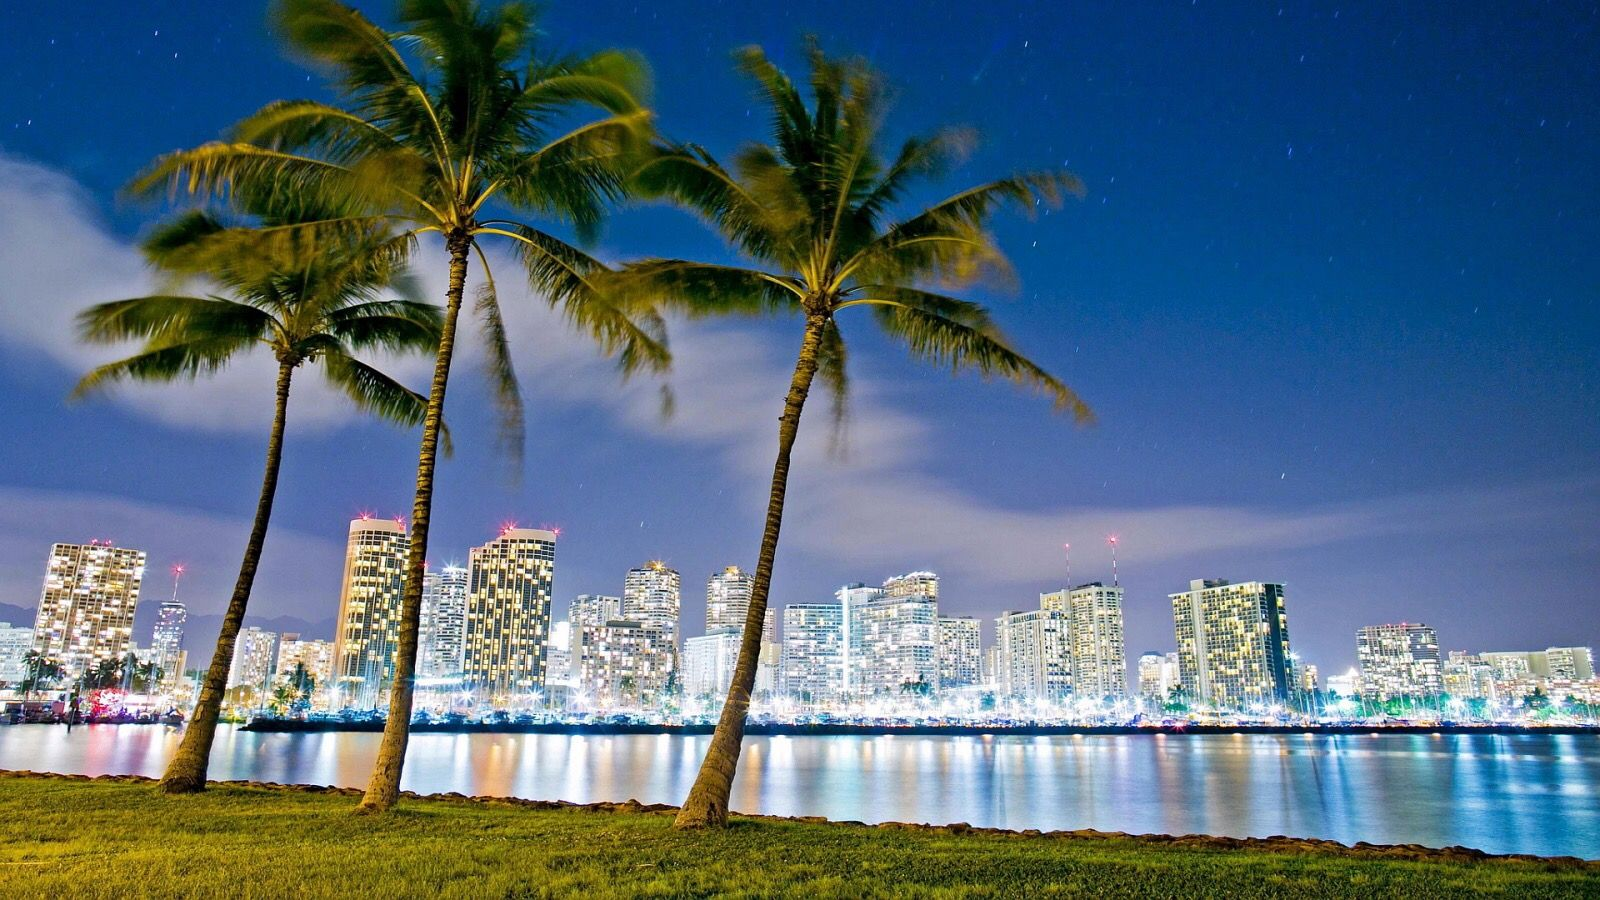 Pin By Bella On Beautiful World Honolulu Oahu Oahu Hawaii Oahu